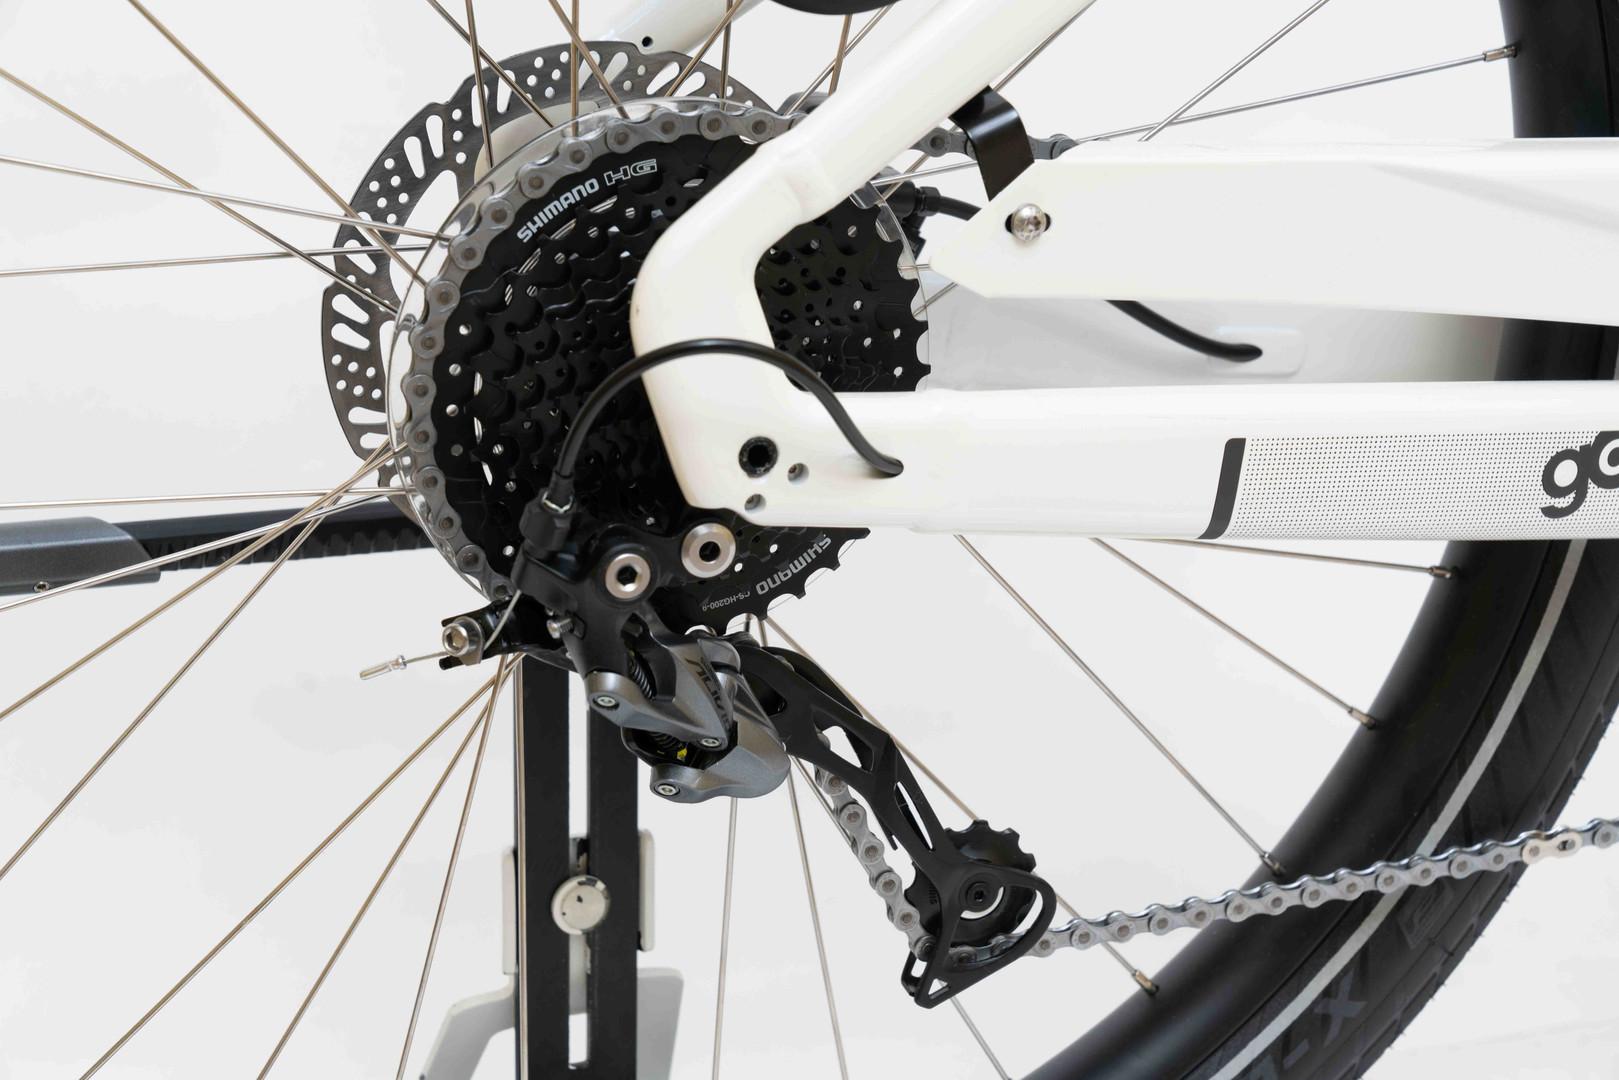 Fahrradladen_Pforzheim_Simoes_Bikes_035.